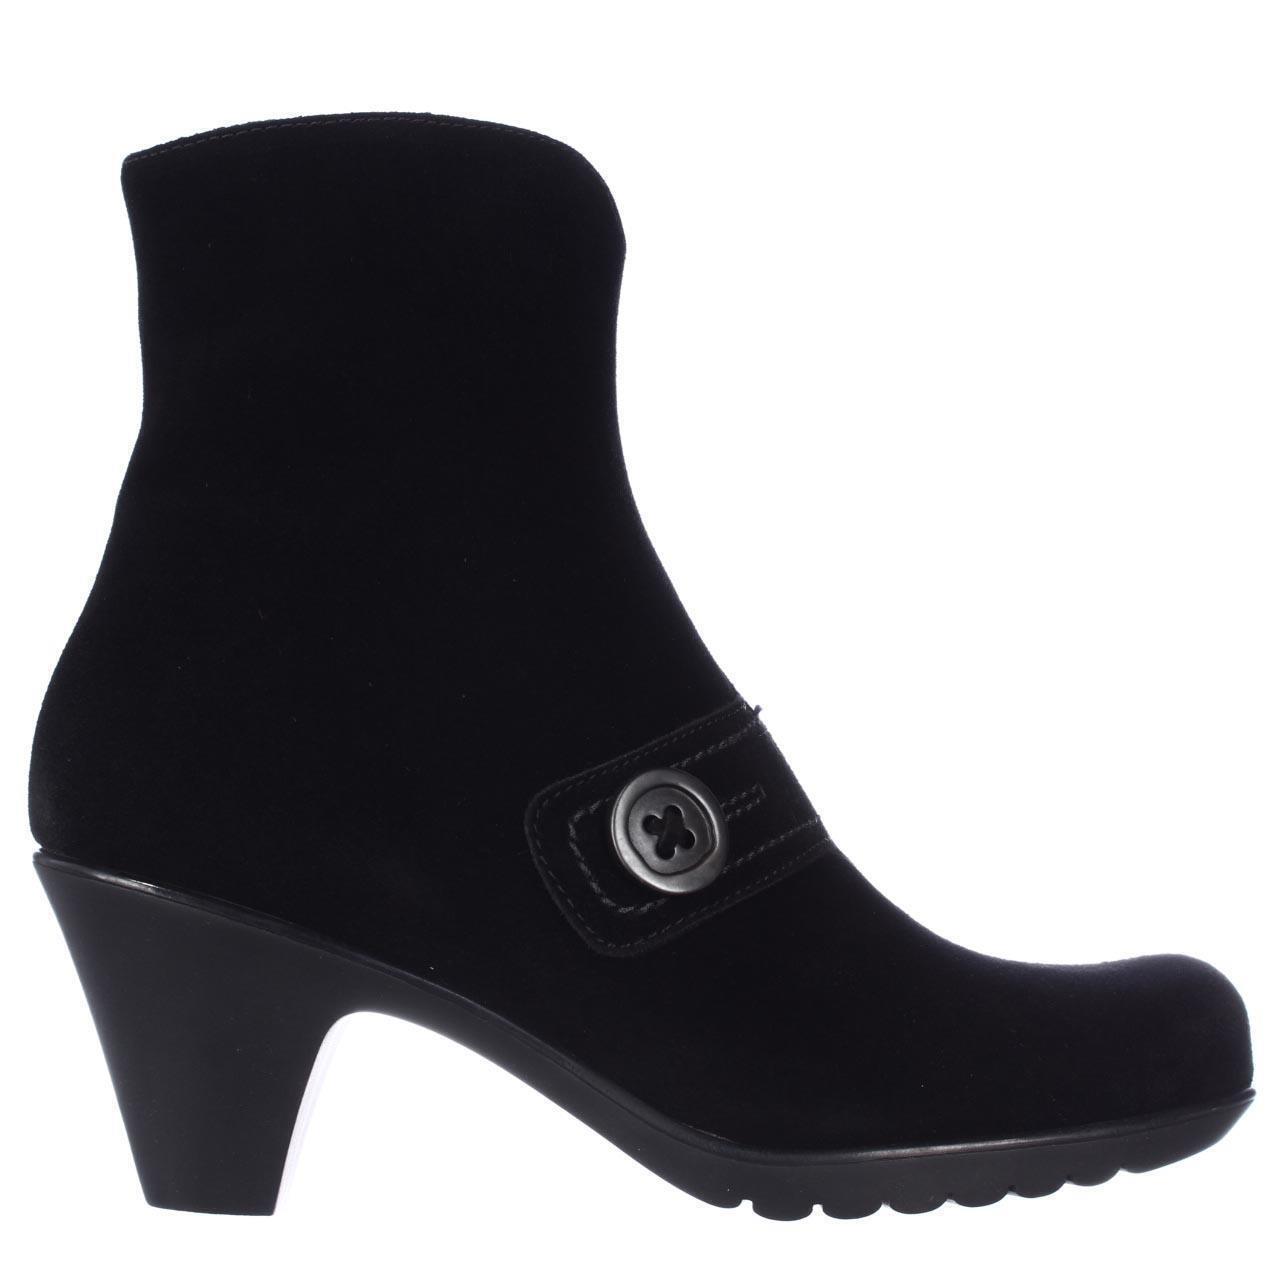 LA CANADIENNE Womens Dorthea Black Suede Suede Suede WATERPROOF Ankle Zip Boots 8.5 NEW 1e6f01